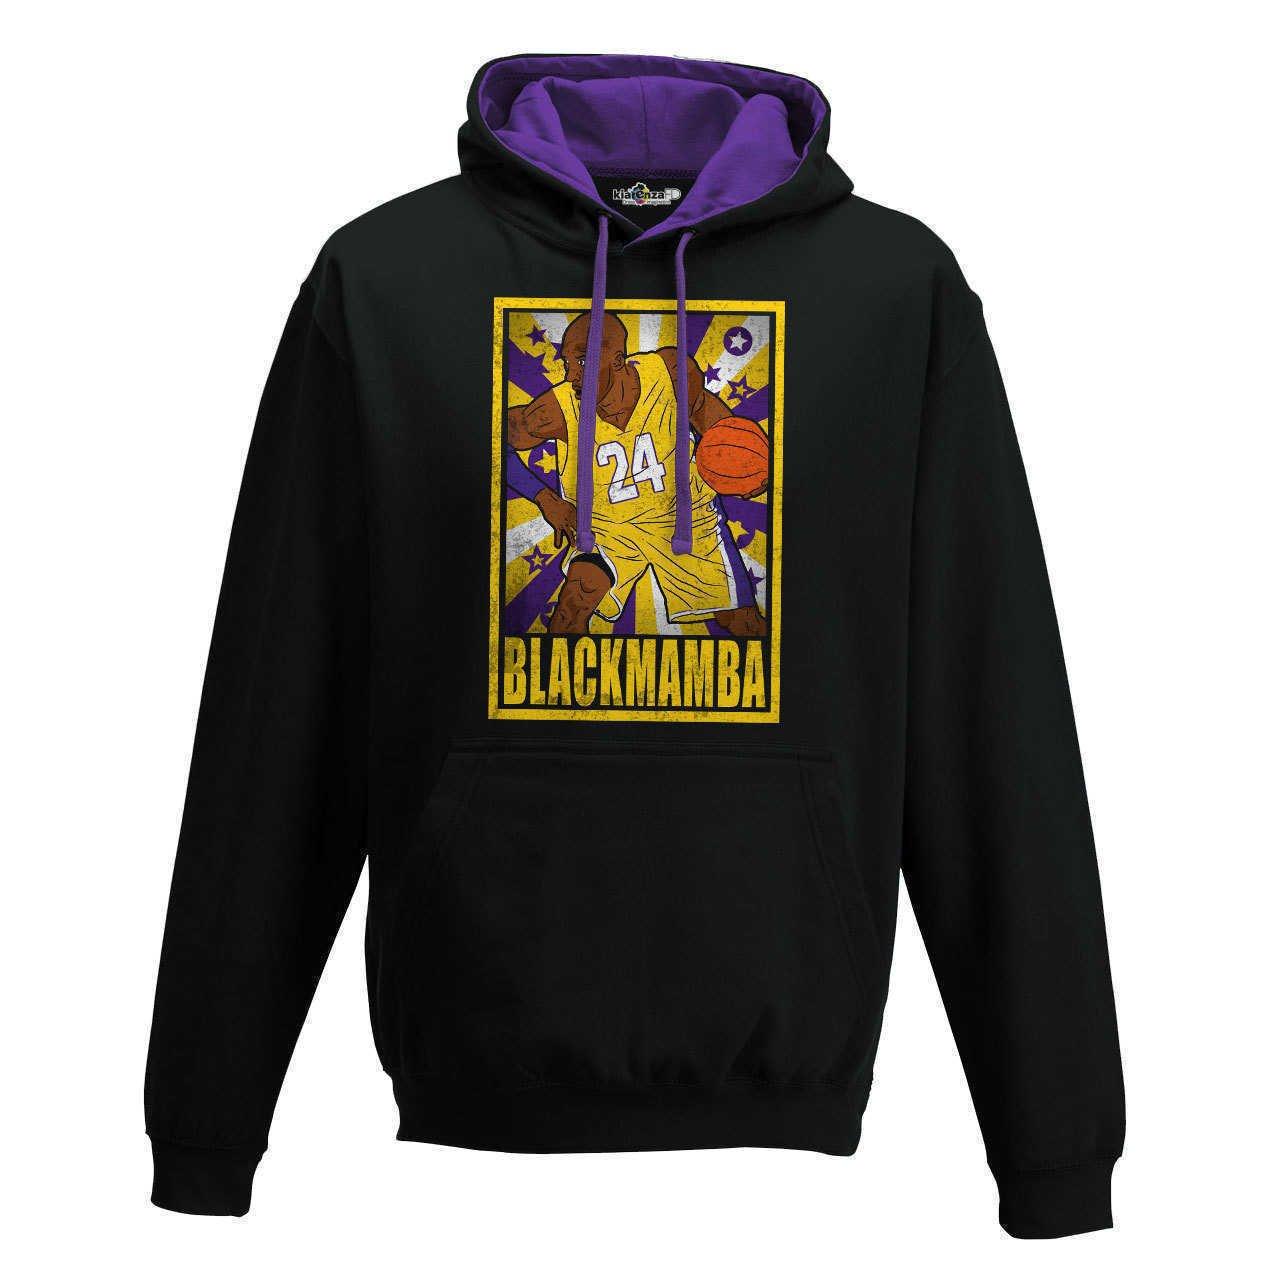 KiarenzaFD Felpa Cappuccio Bico Basket Vintage Parodia Kobe all Star Bryant Black Mamba 1